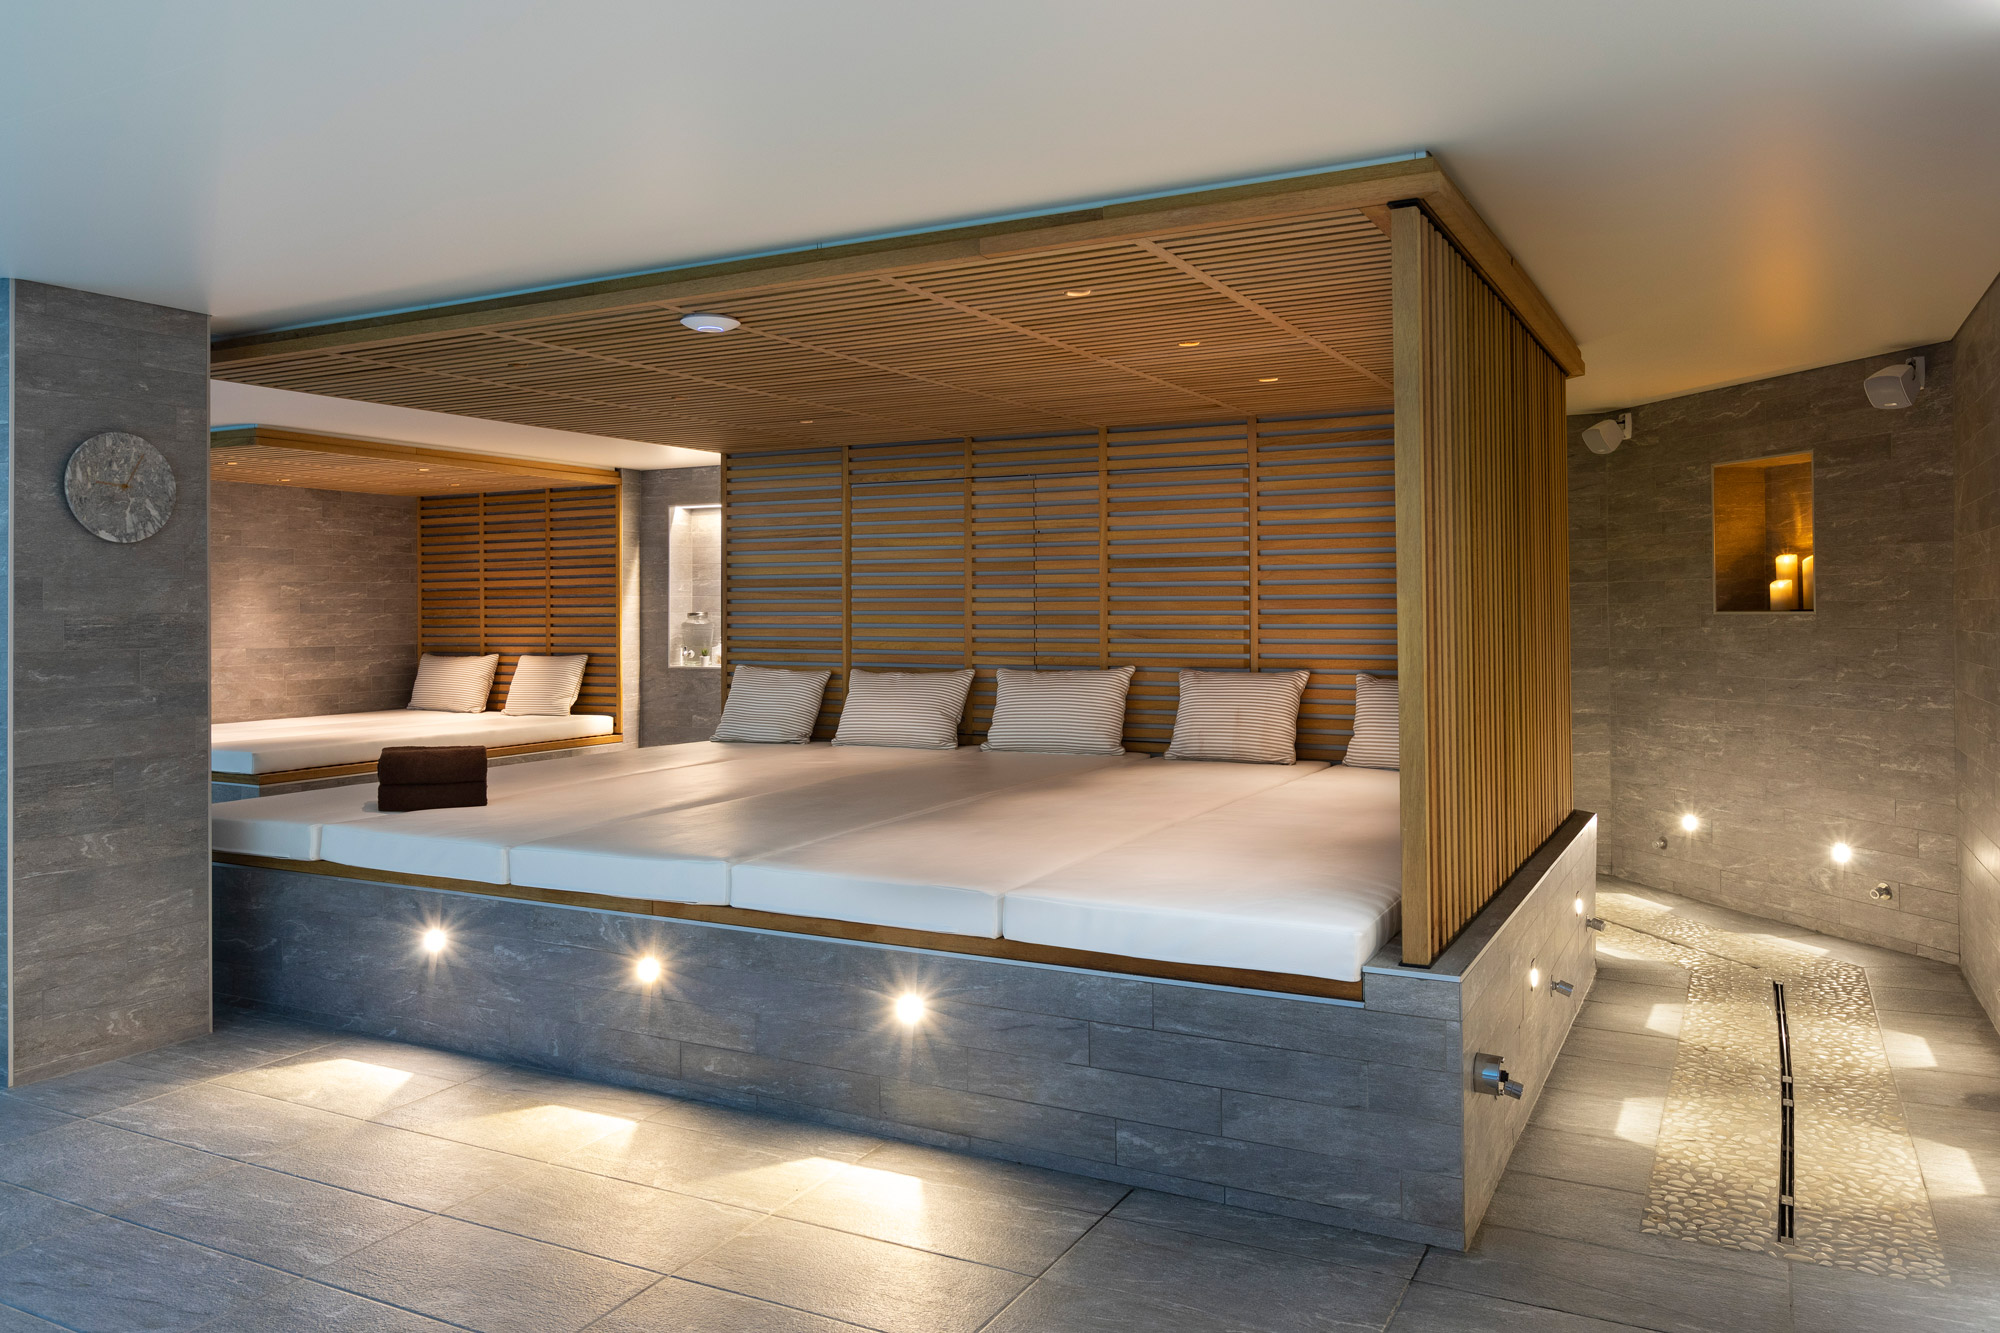 St-Alban-Hotel-&-Spa—Banquettes-piscine